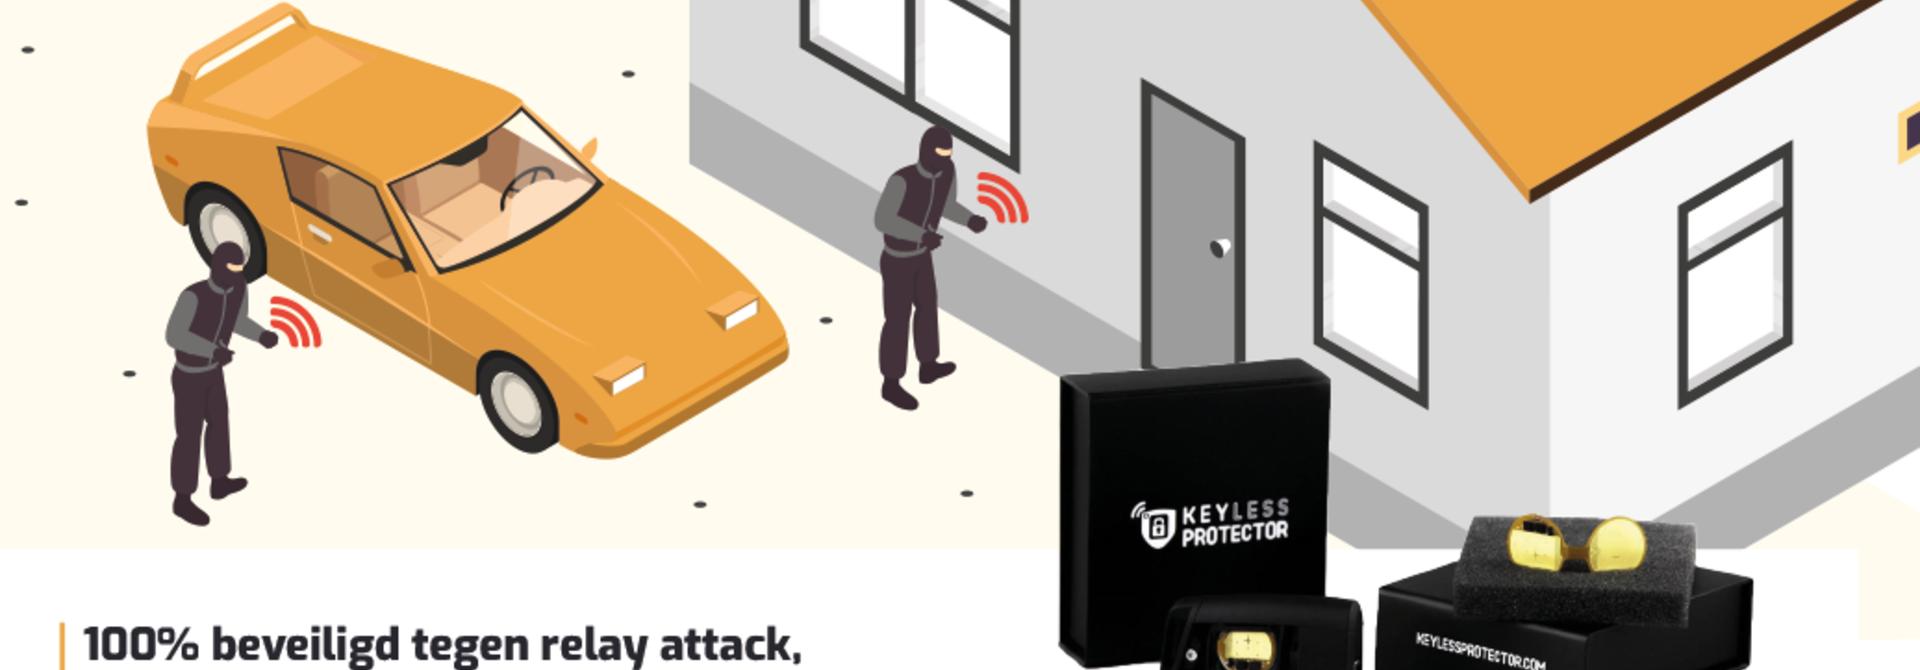 KE01 Keyless Protector dealer worden?